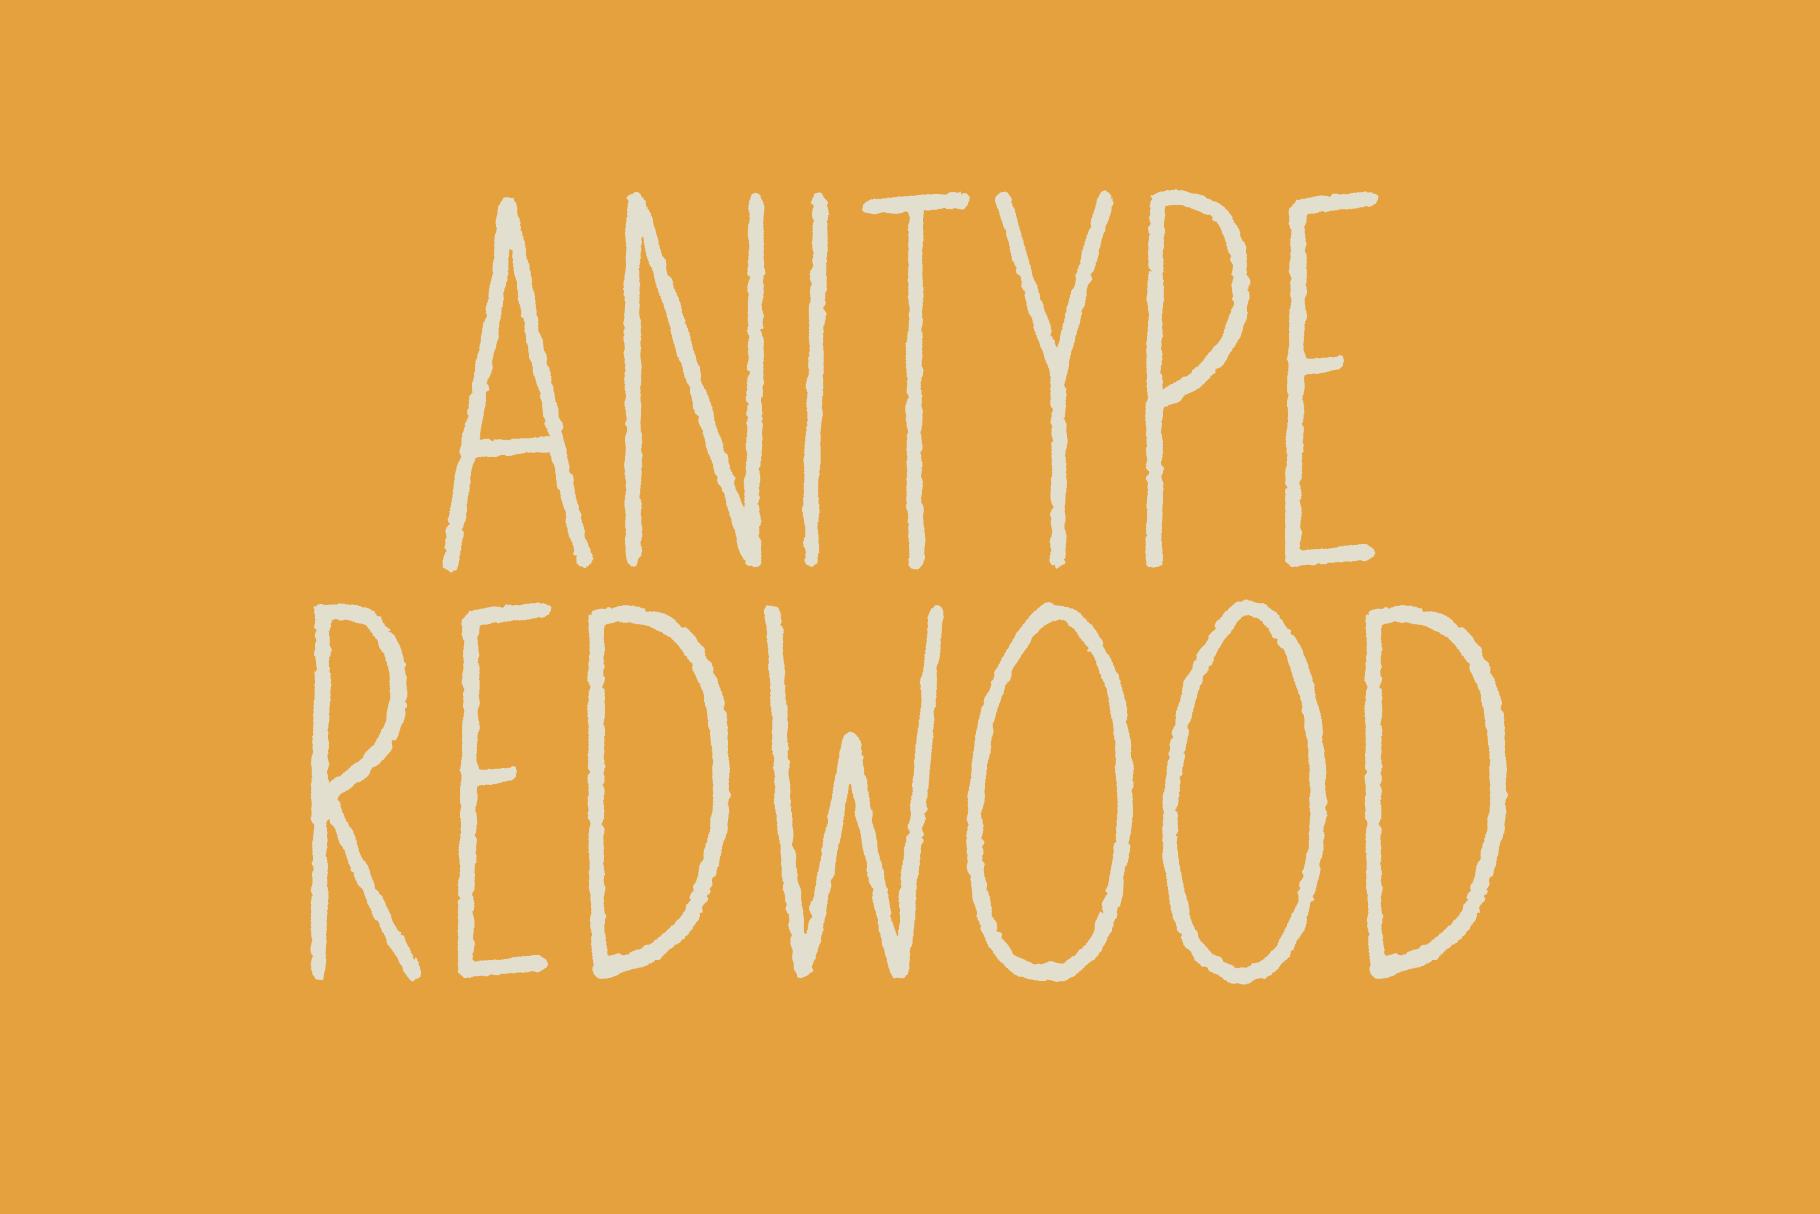 Anitype Redwood